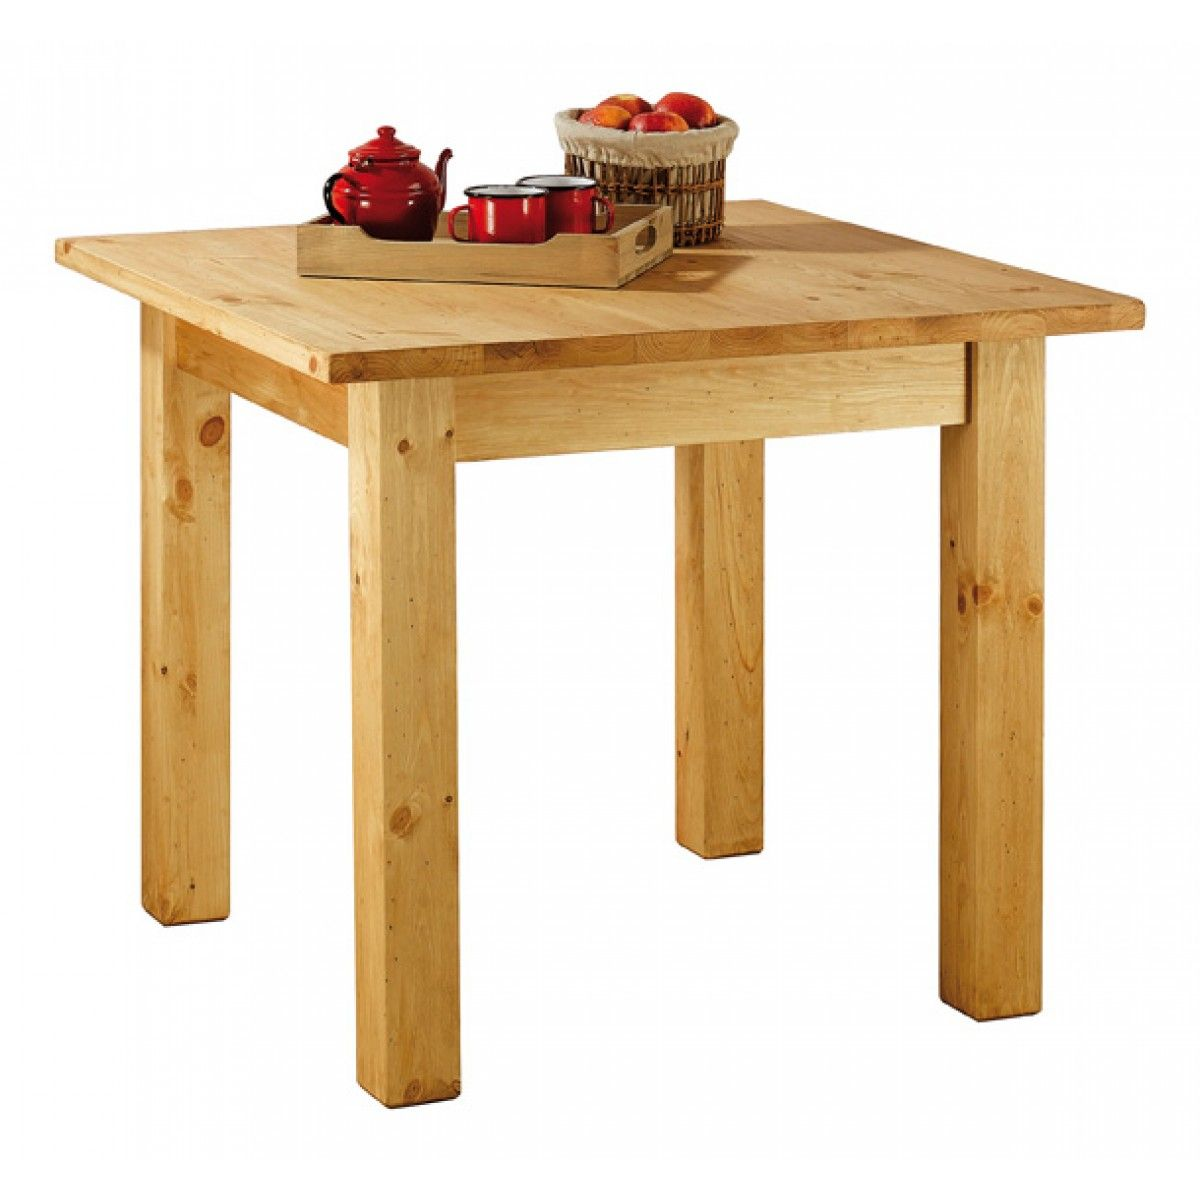 table carrée rustique en pin massif 90 cm farmer | table repas en